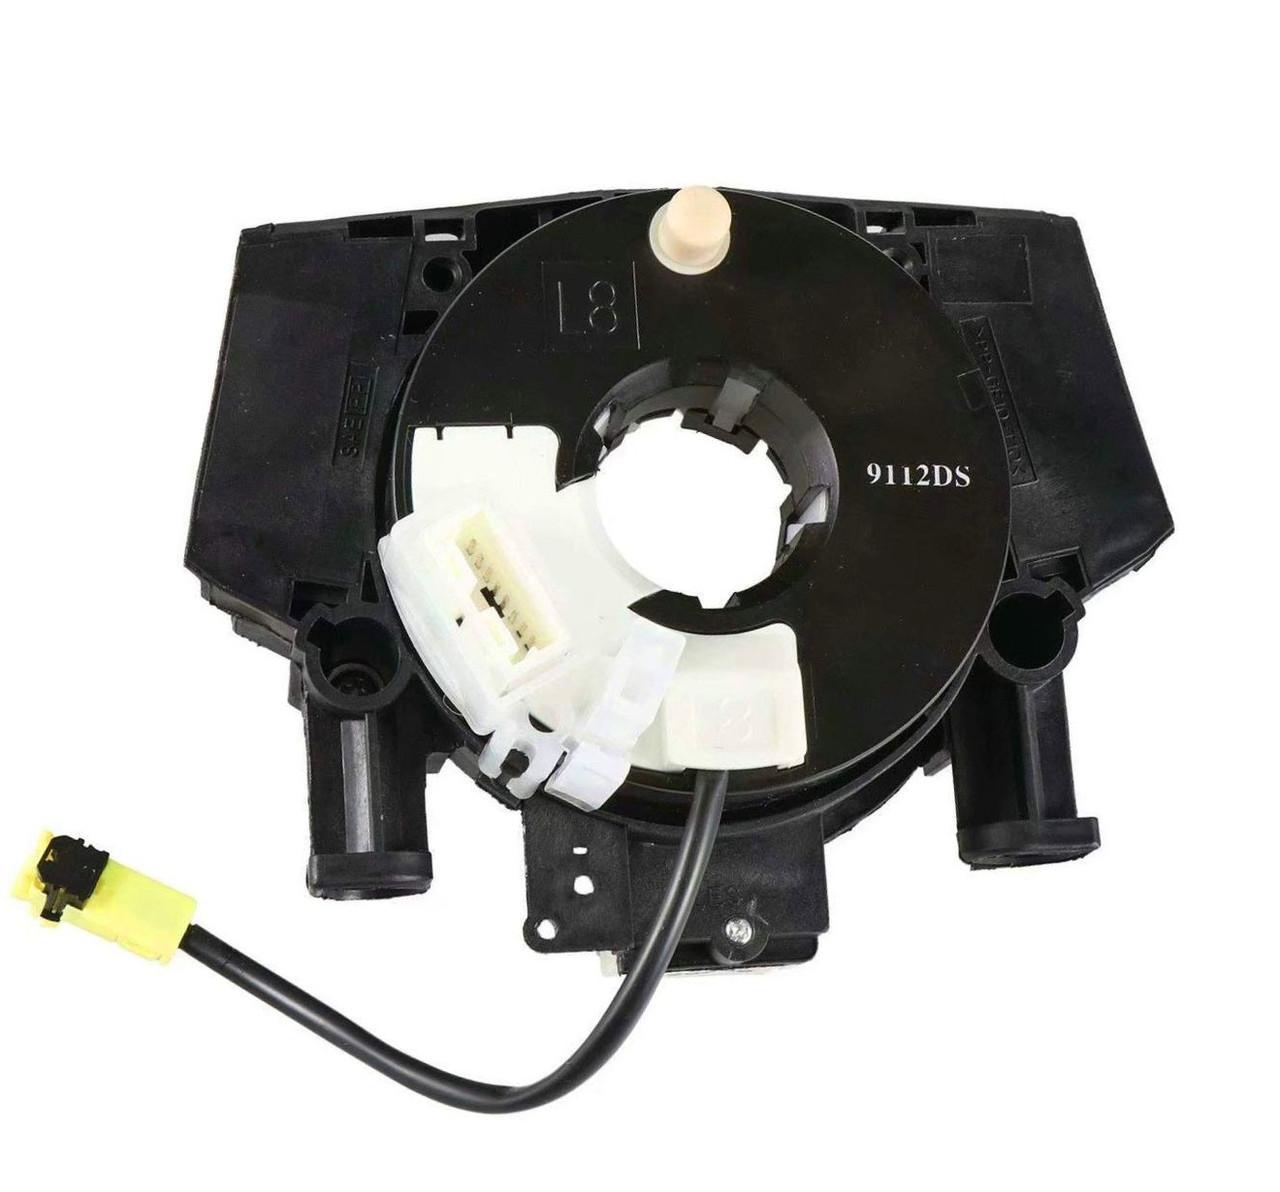 Шлейф подрулевой подушки безопасности Airbag улитка руля Kapaco Nissan Qashqai 1 провод 25560, 25567, B5567